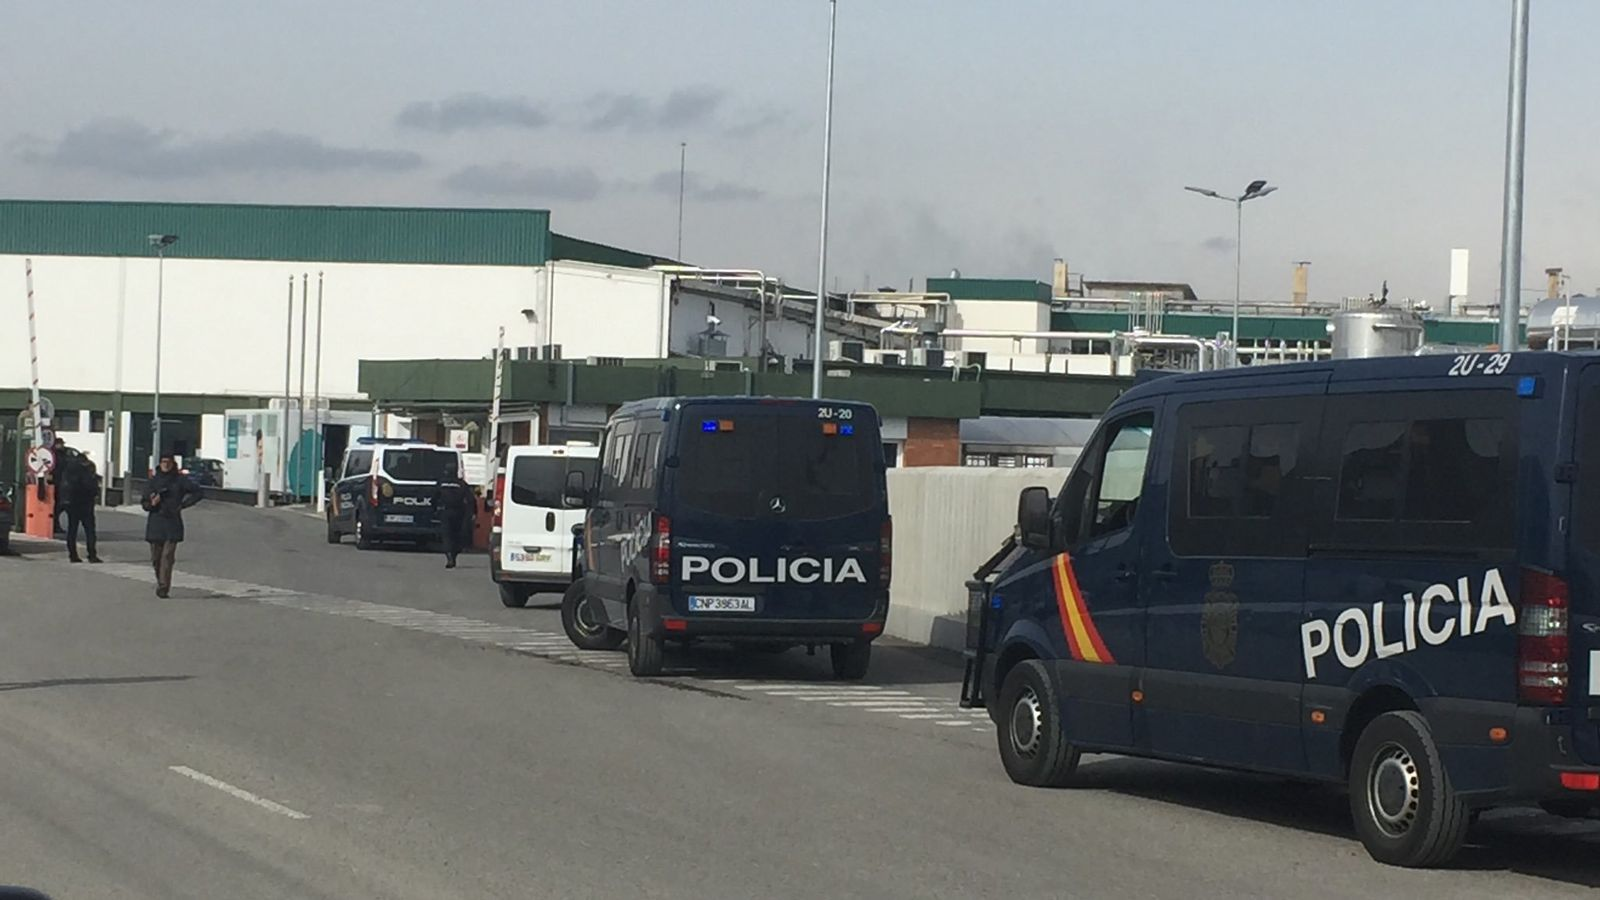 Efectius de la Policia Nacional intervenen a Le Porc Gourmet.